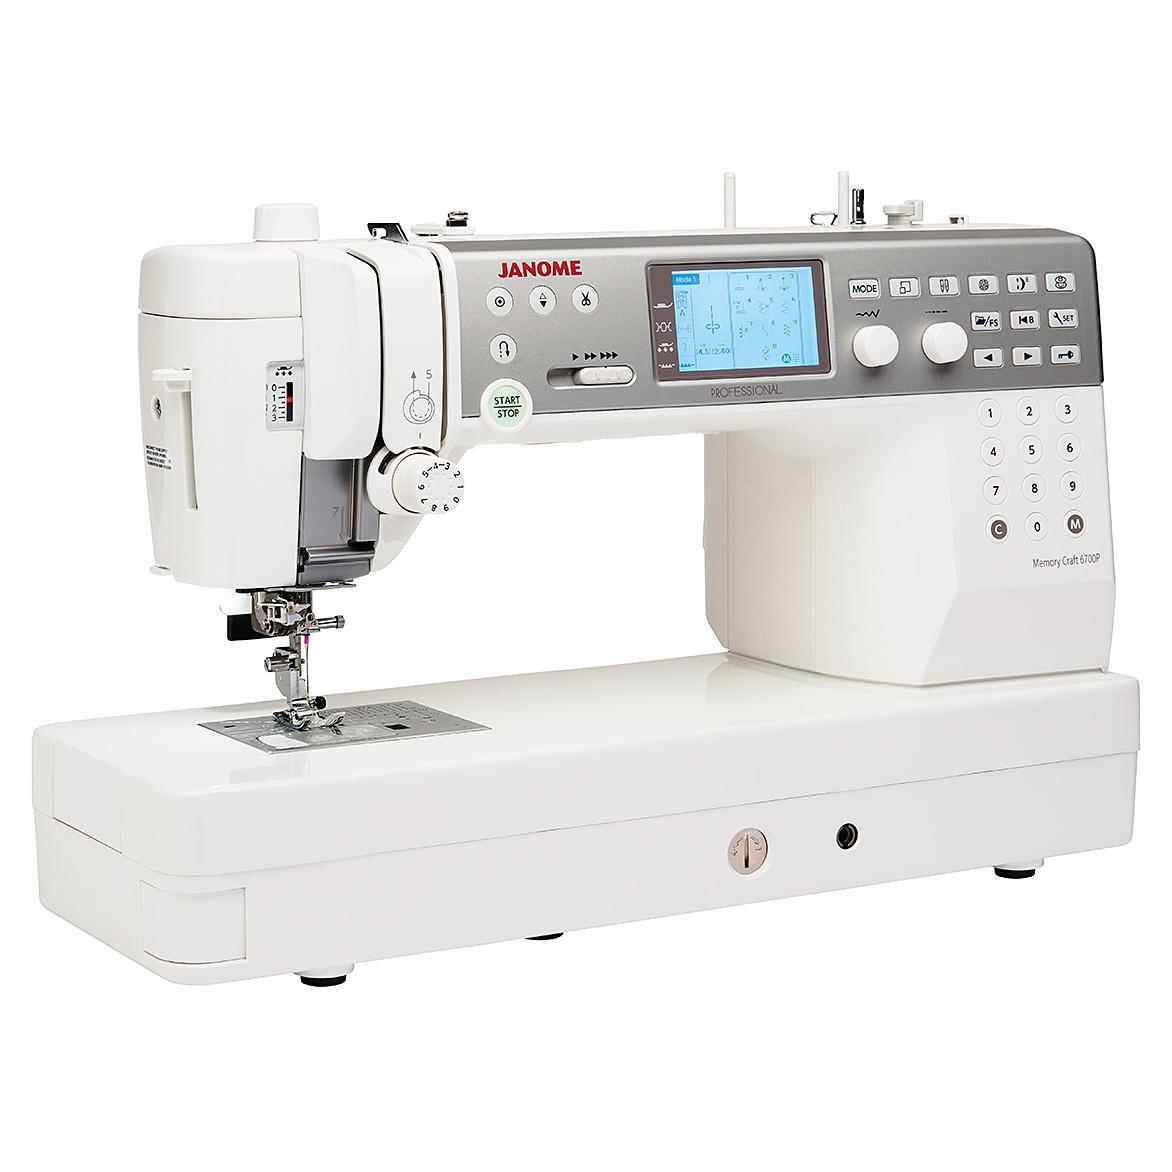 Janome Memory Craft 6700 Professional Sewing Machine